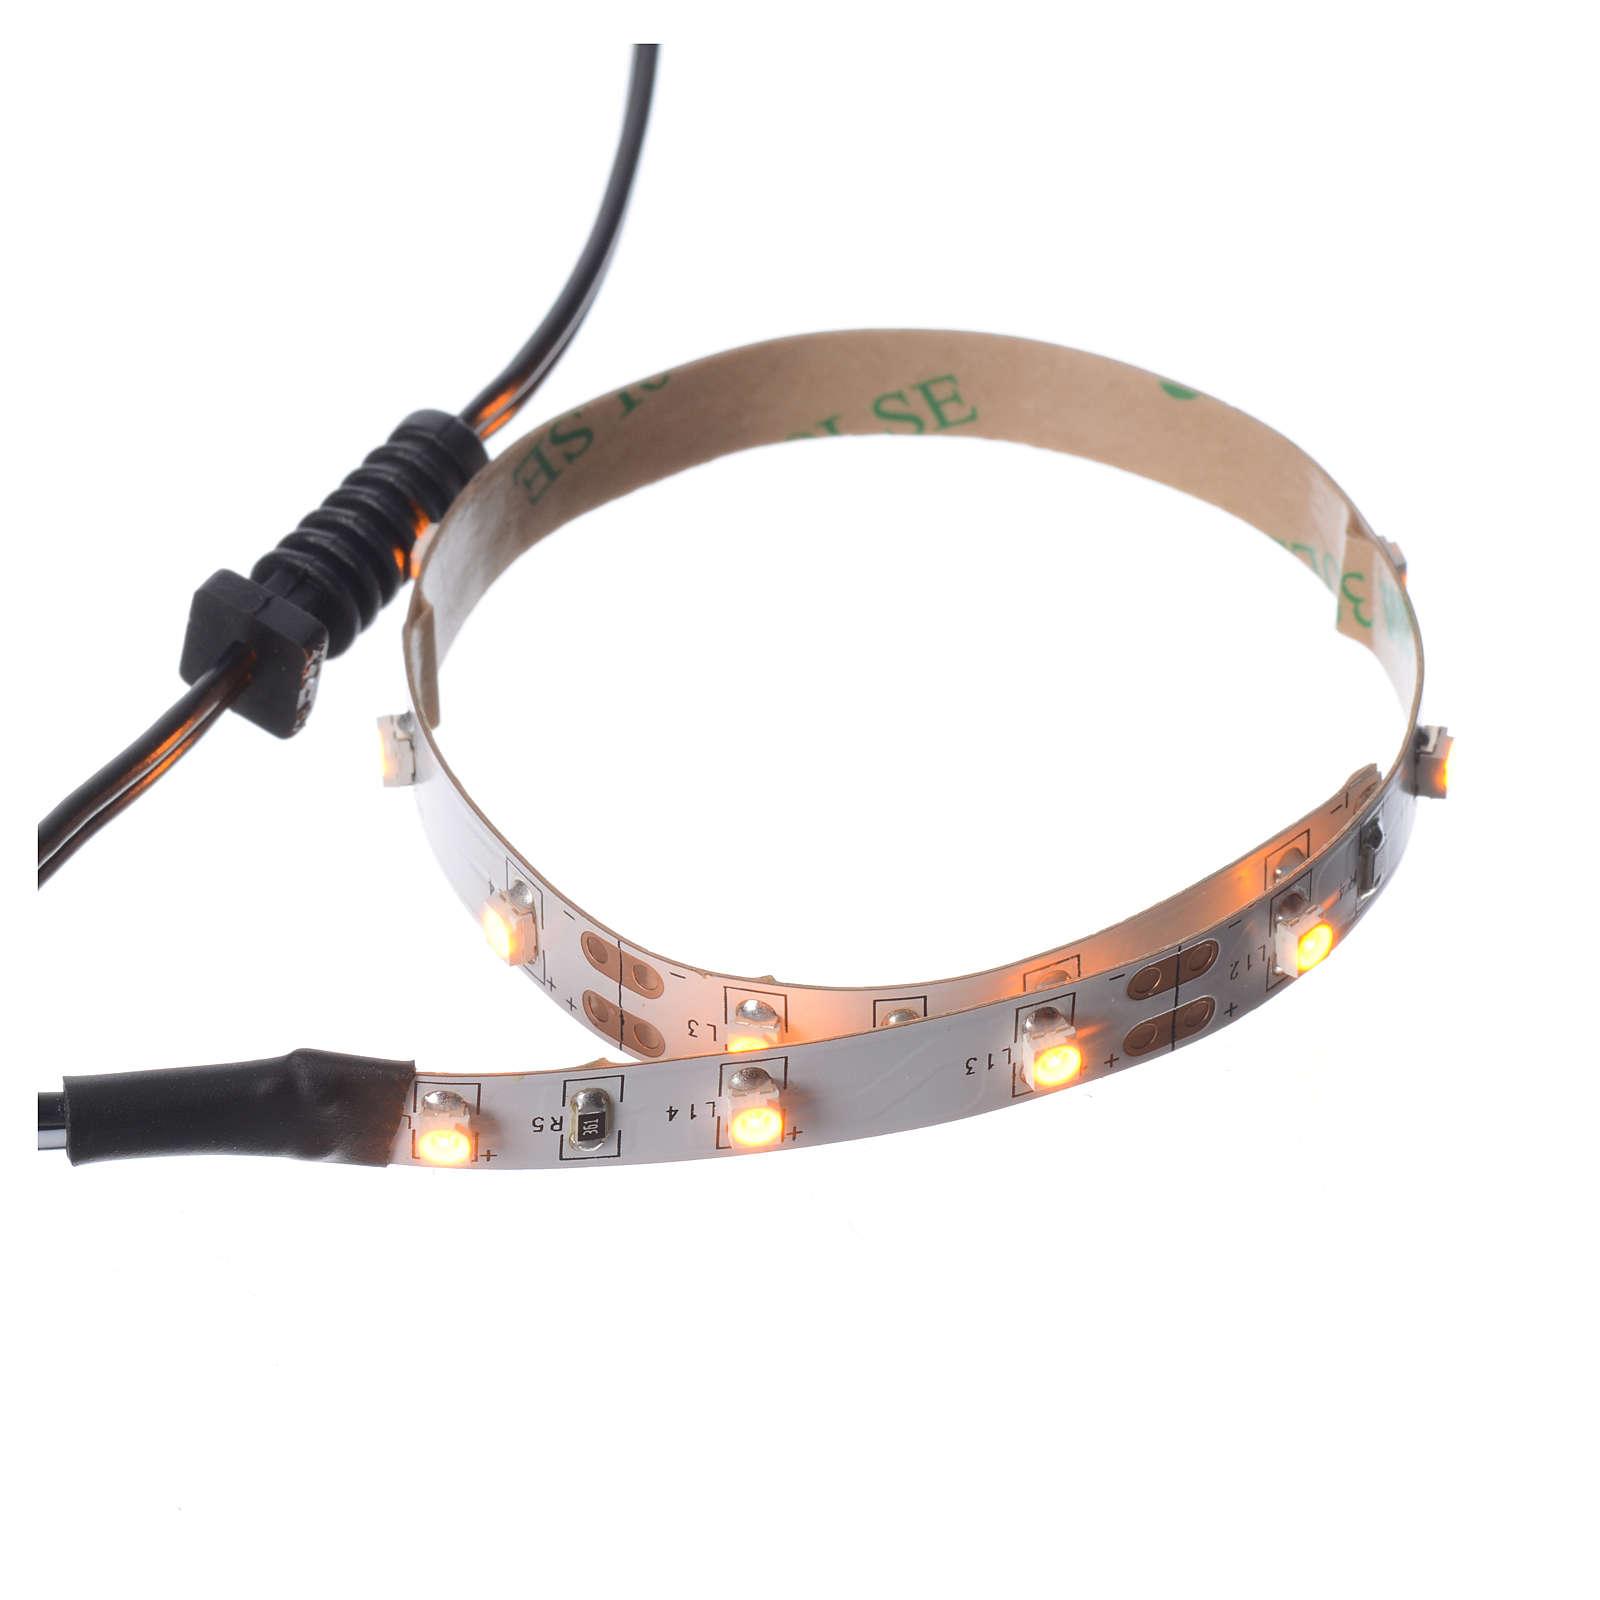 Tira de LED Power 'PS' 15 LED 0.8 x 25 cm. amarillo Frial Power 4